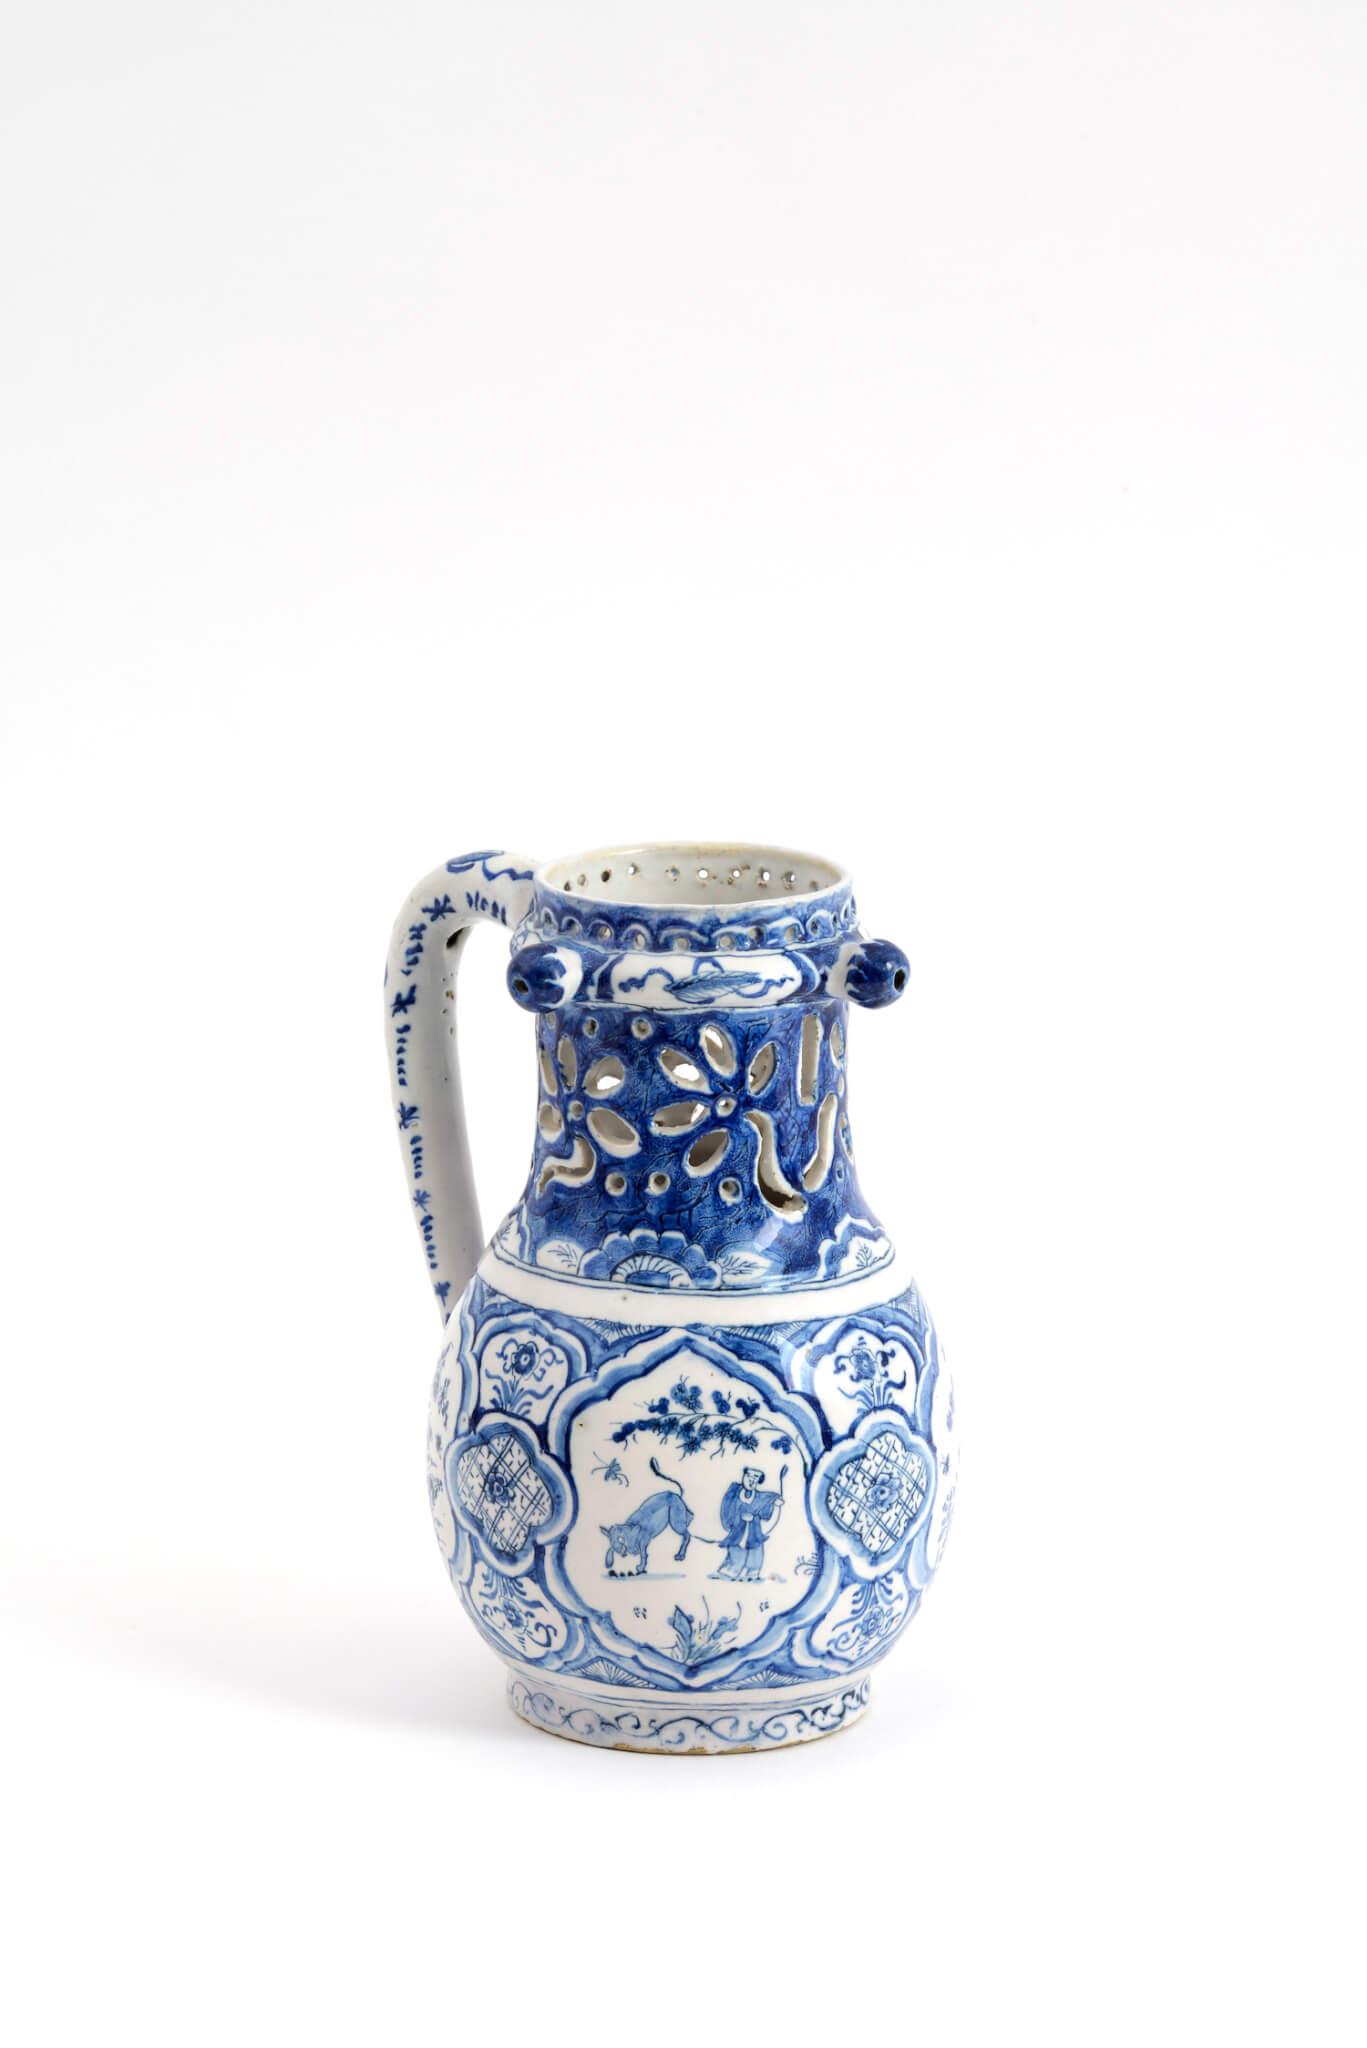 Delftware Puzzle jug Aronson Antiquairs